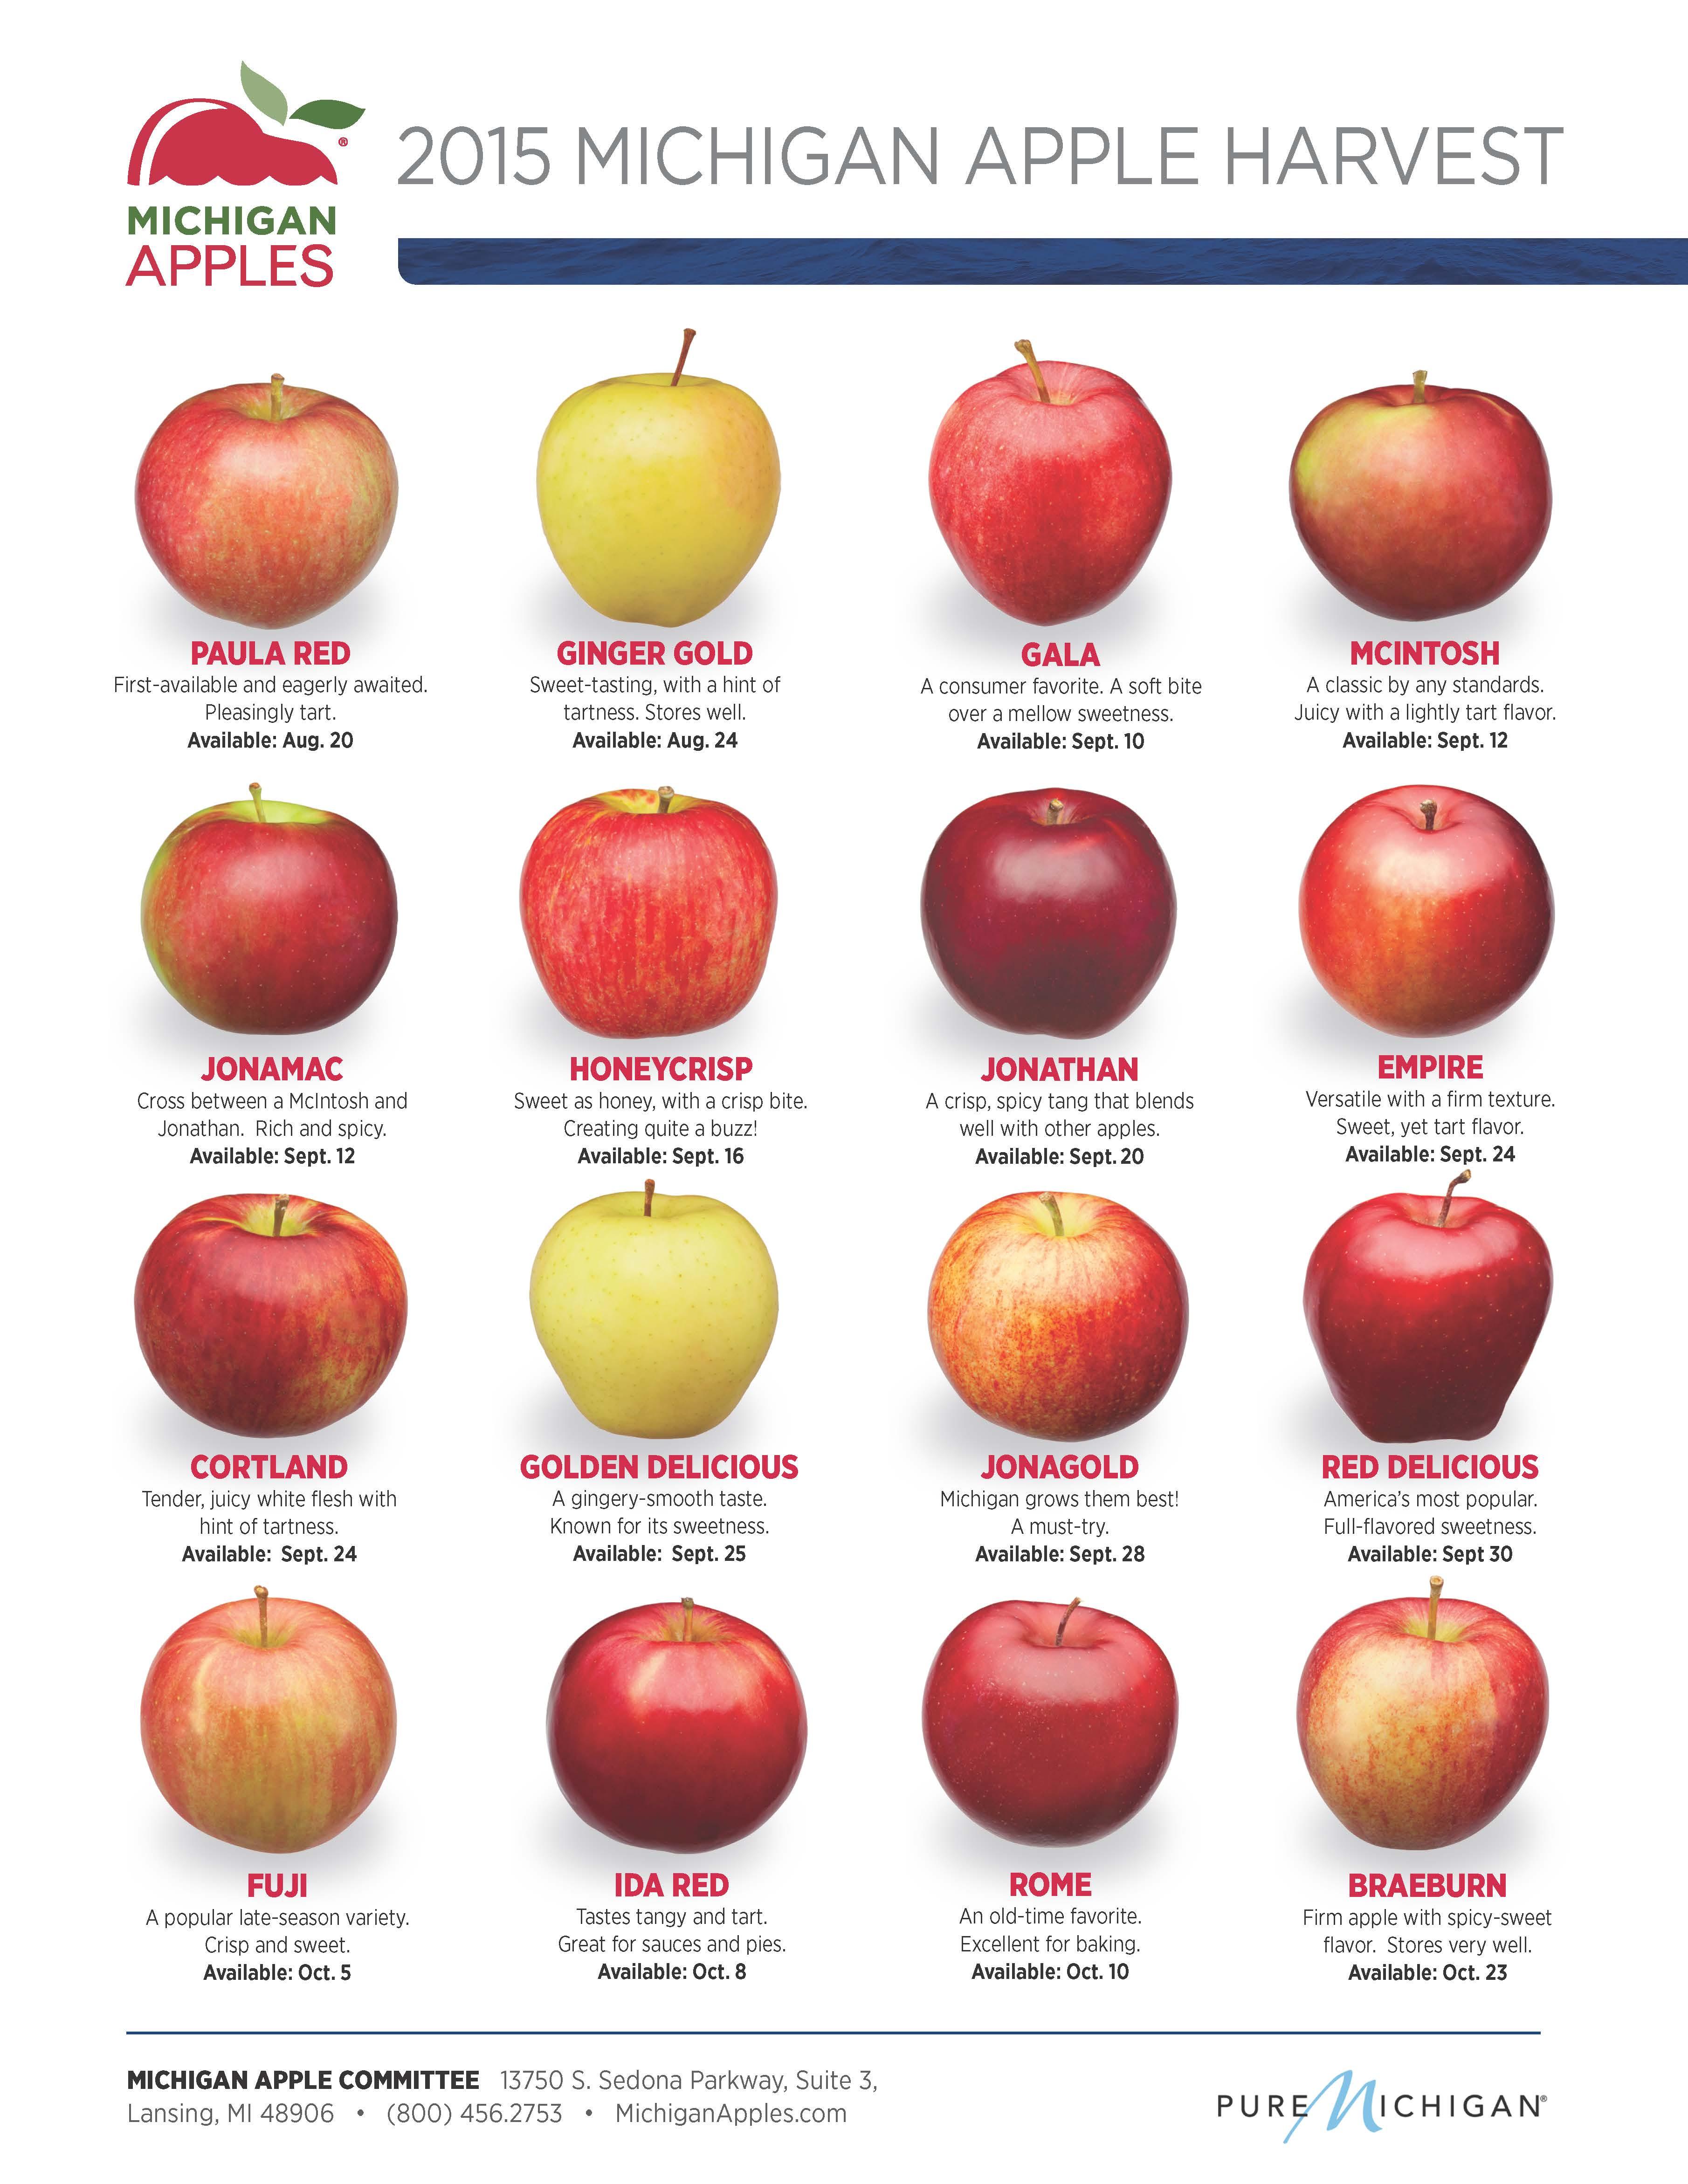 2015 Michigan Apple Harvest Michigan Apple Committee